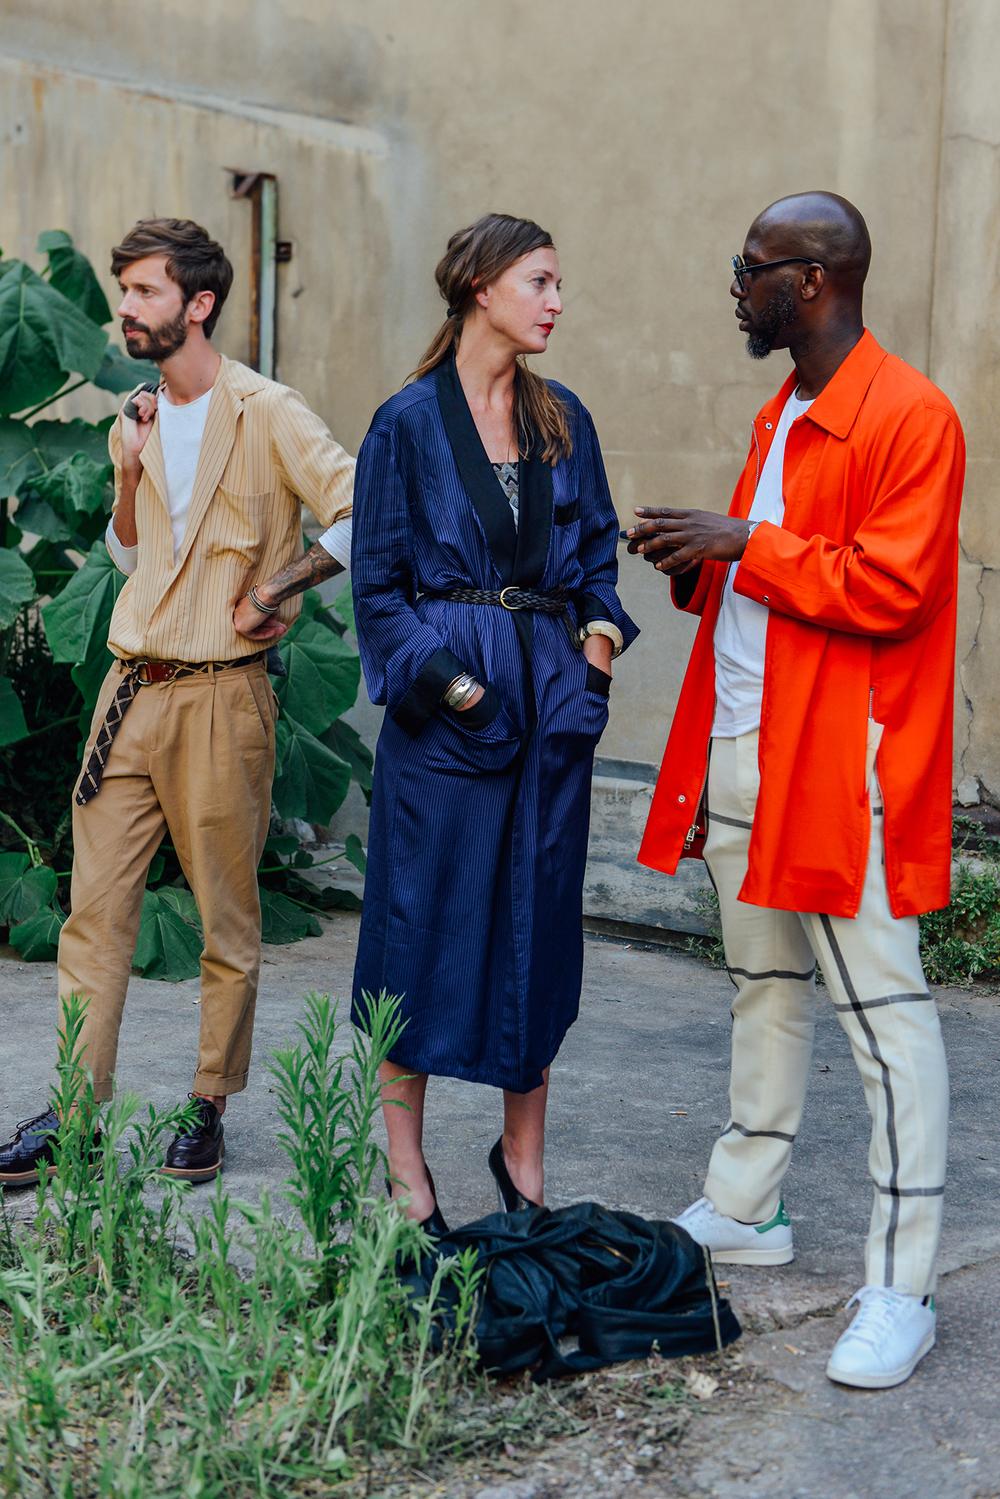 17-spring-2016-menswear-street-style-03.jpg